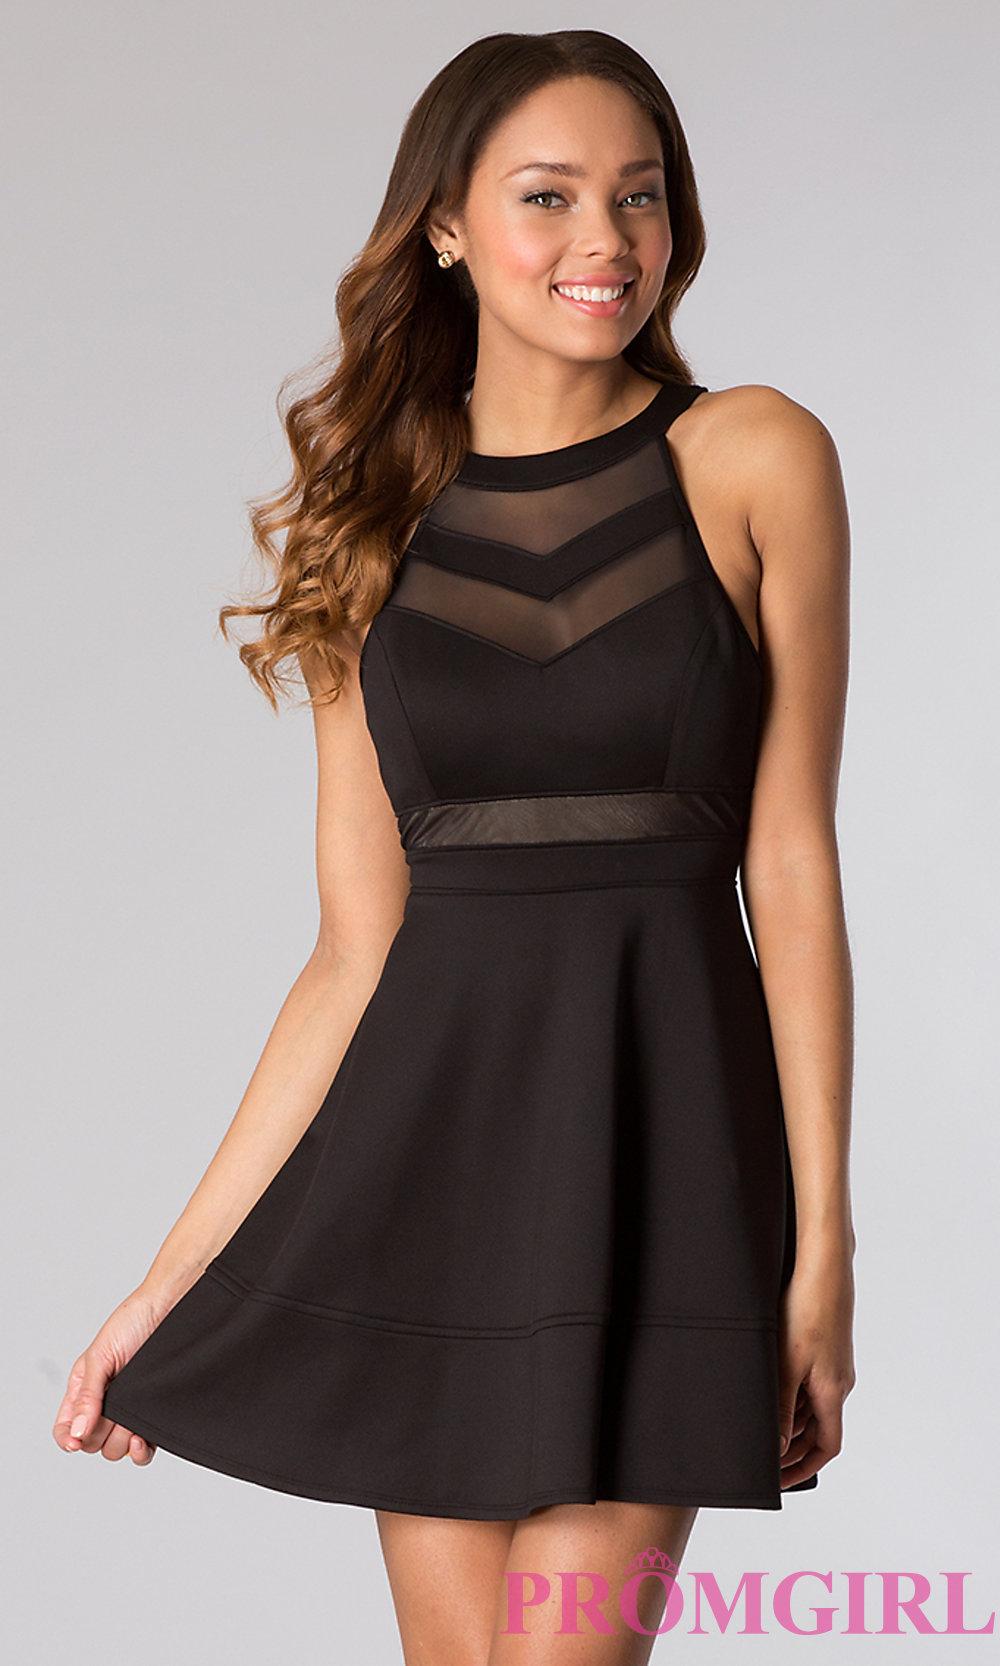 black dress hover to zoom BQGEJMK